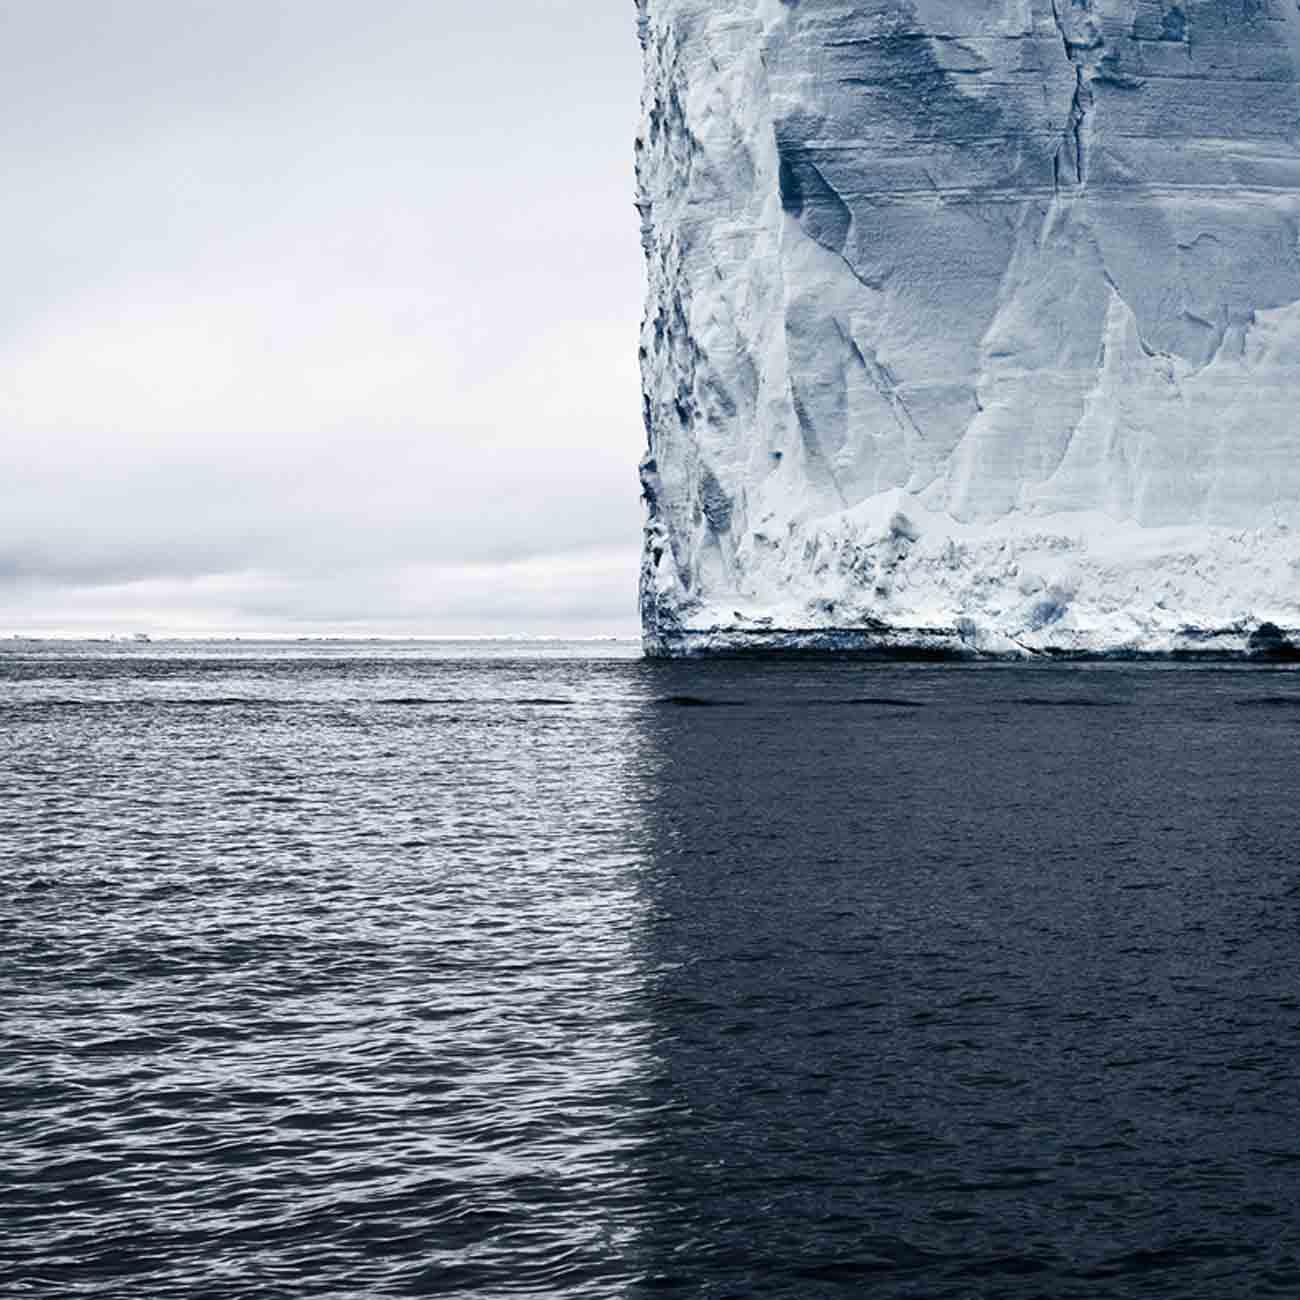 Mercators Projection, Antarctica, 2007 - David Burdeny